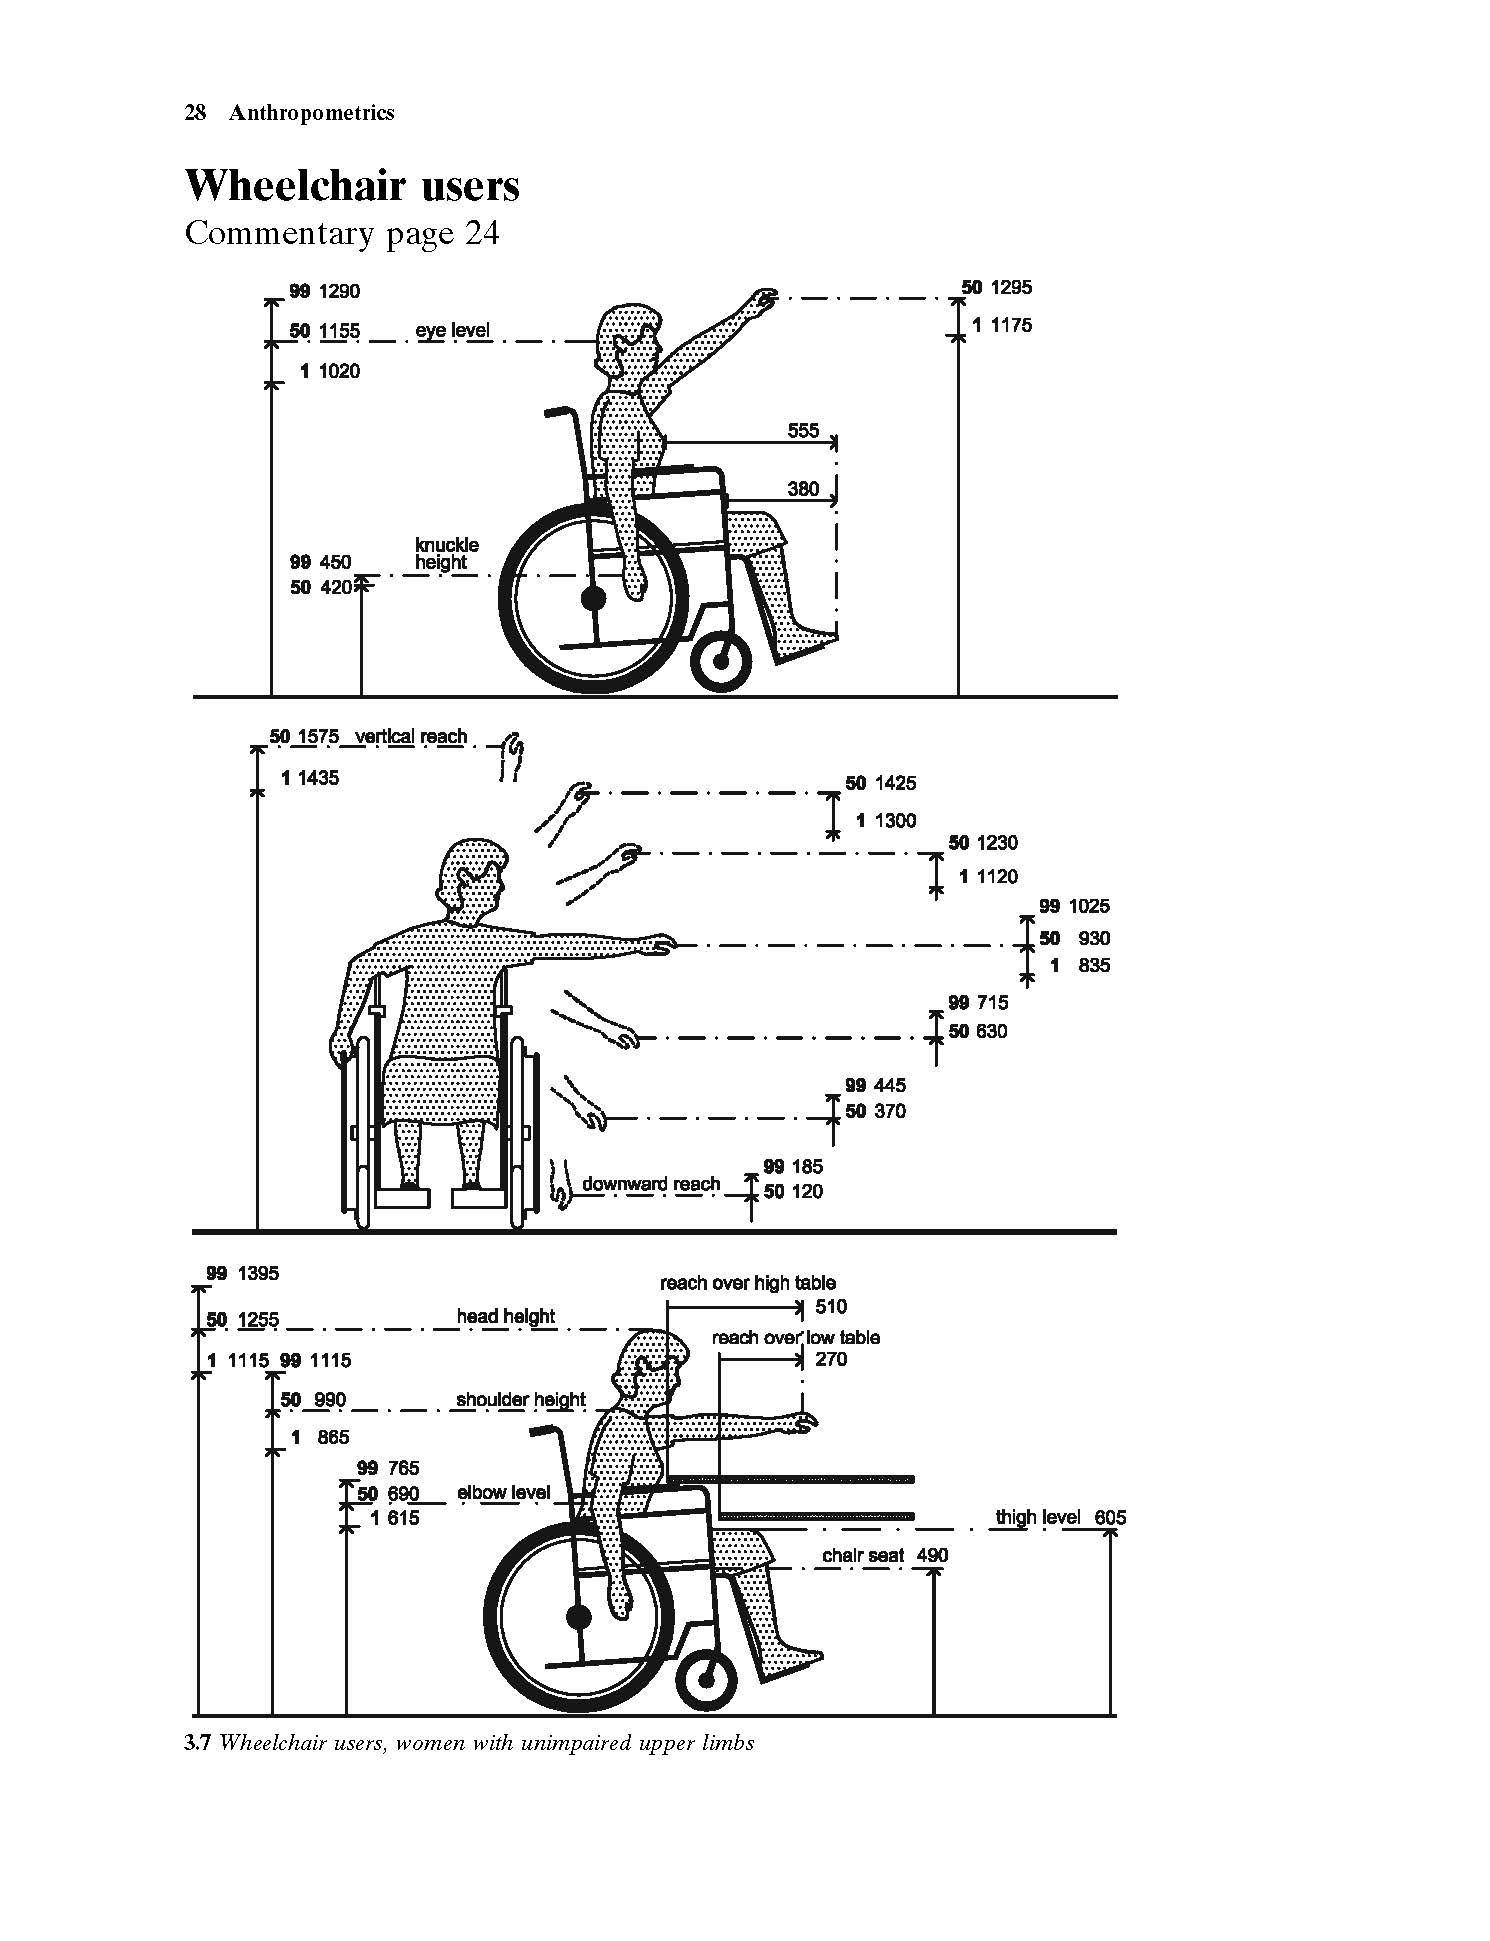 ergonomic chair design guidelines lift chairs dayton ohio universal wheelchair access wheels up